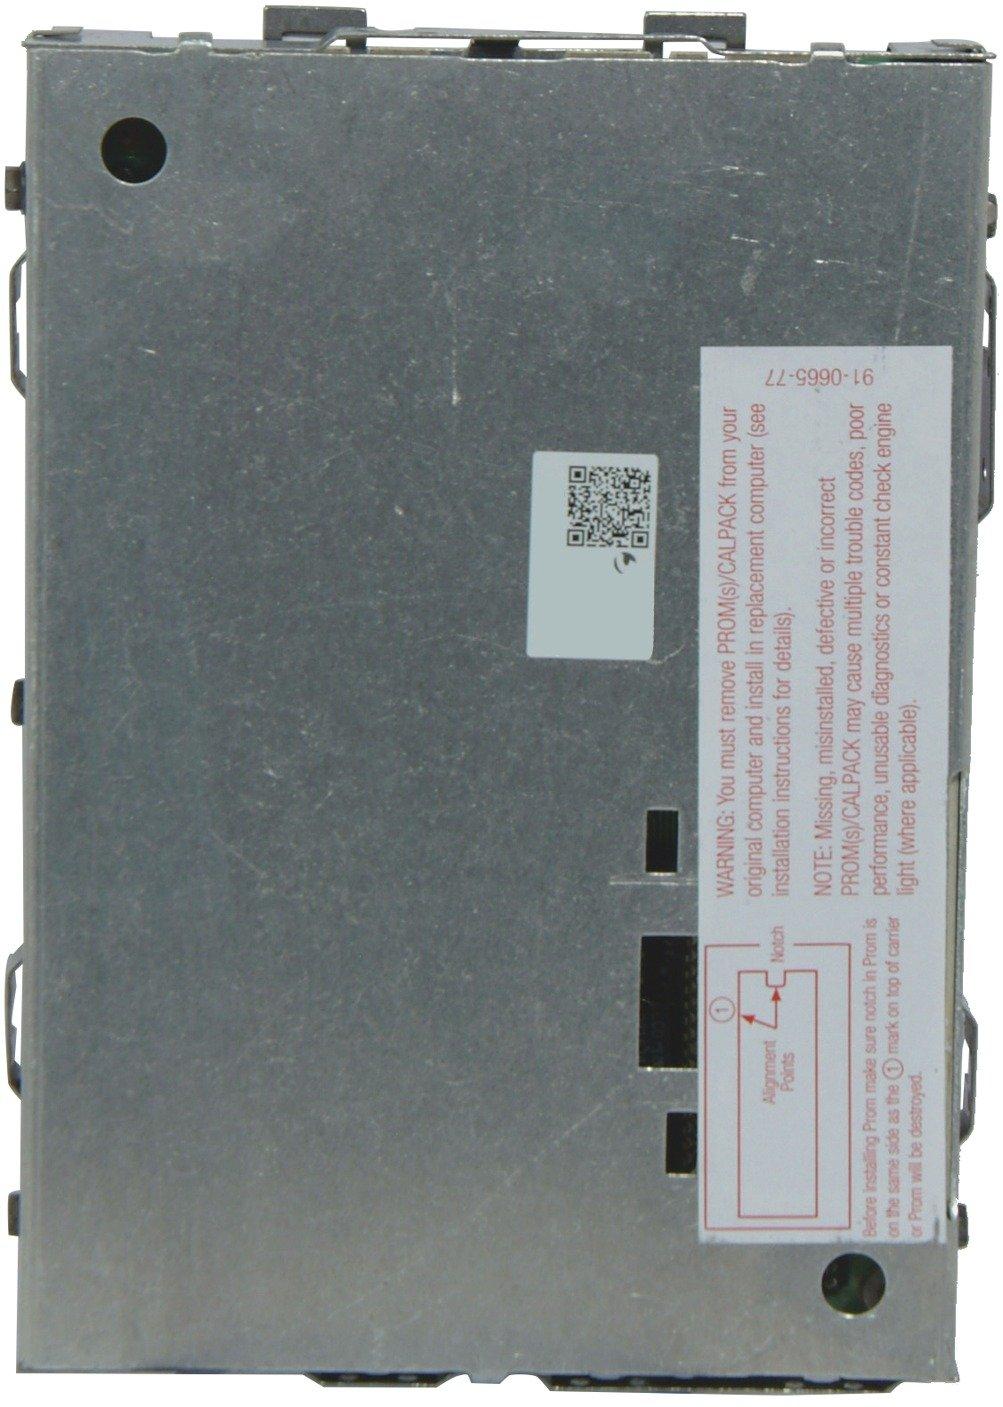 Cardone 77-4810 Remanufactured General Motors Computer A1 Cardone A1  77-4810